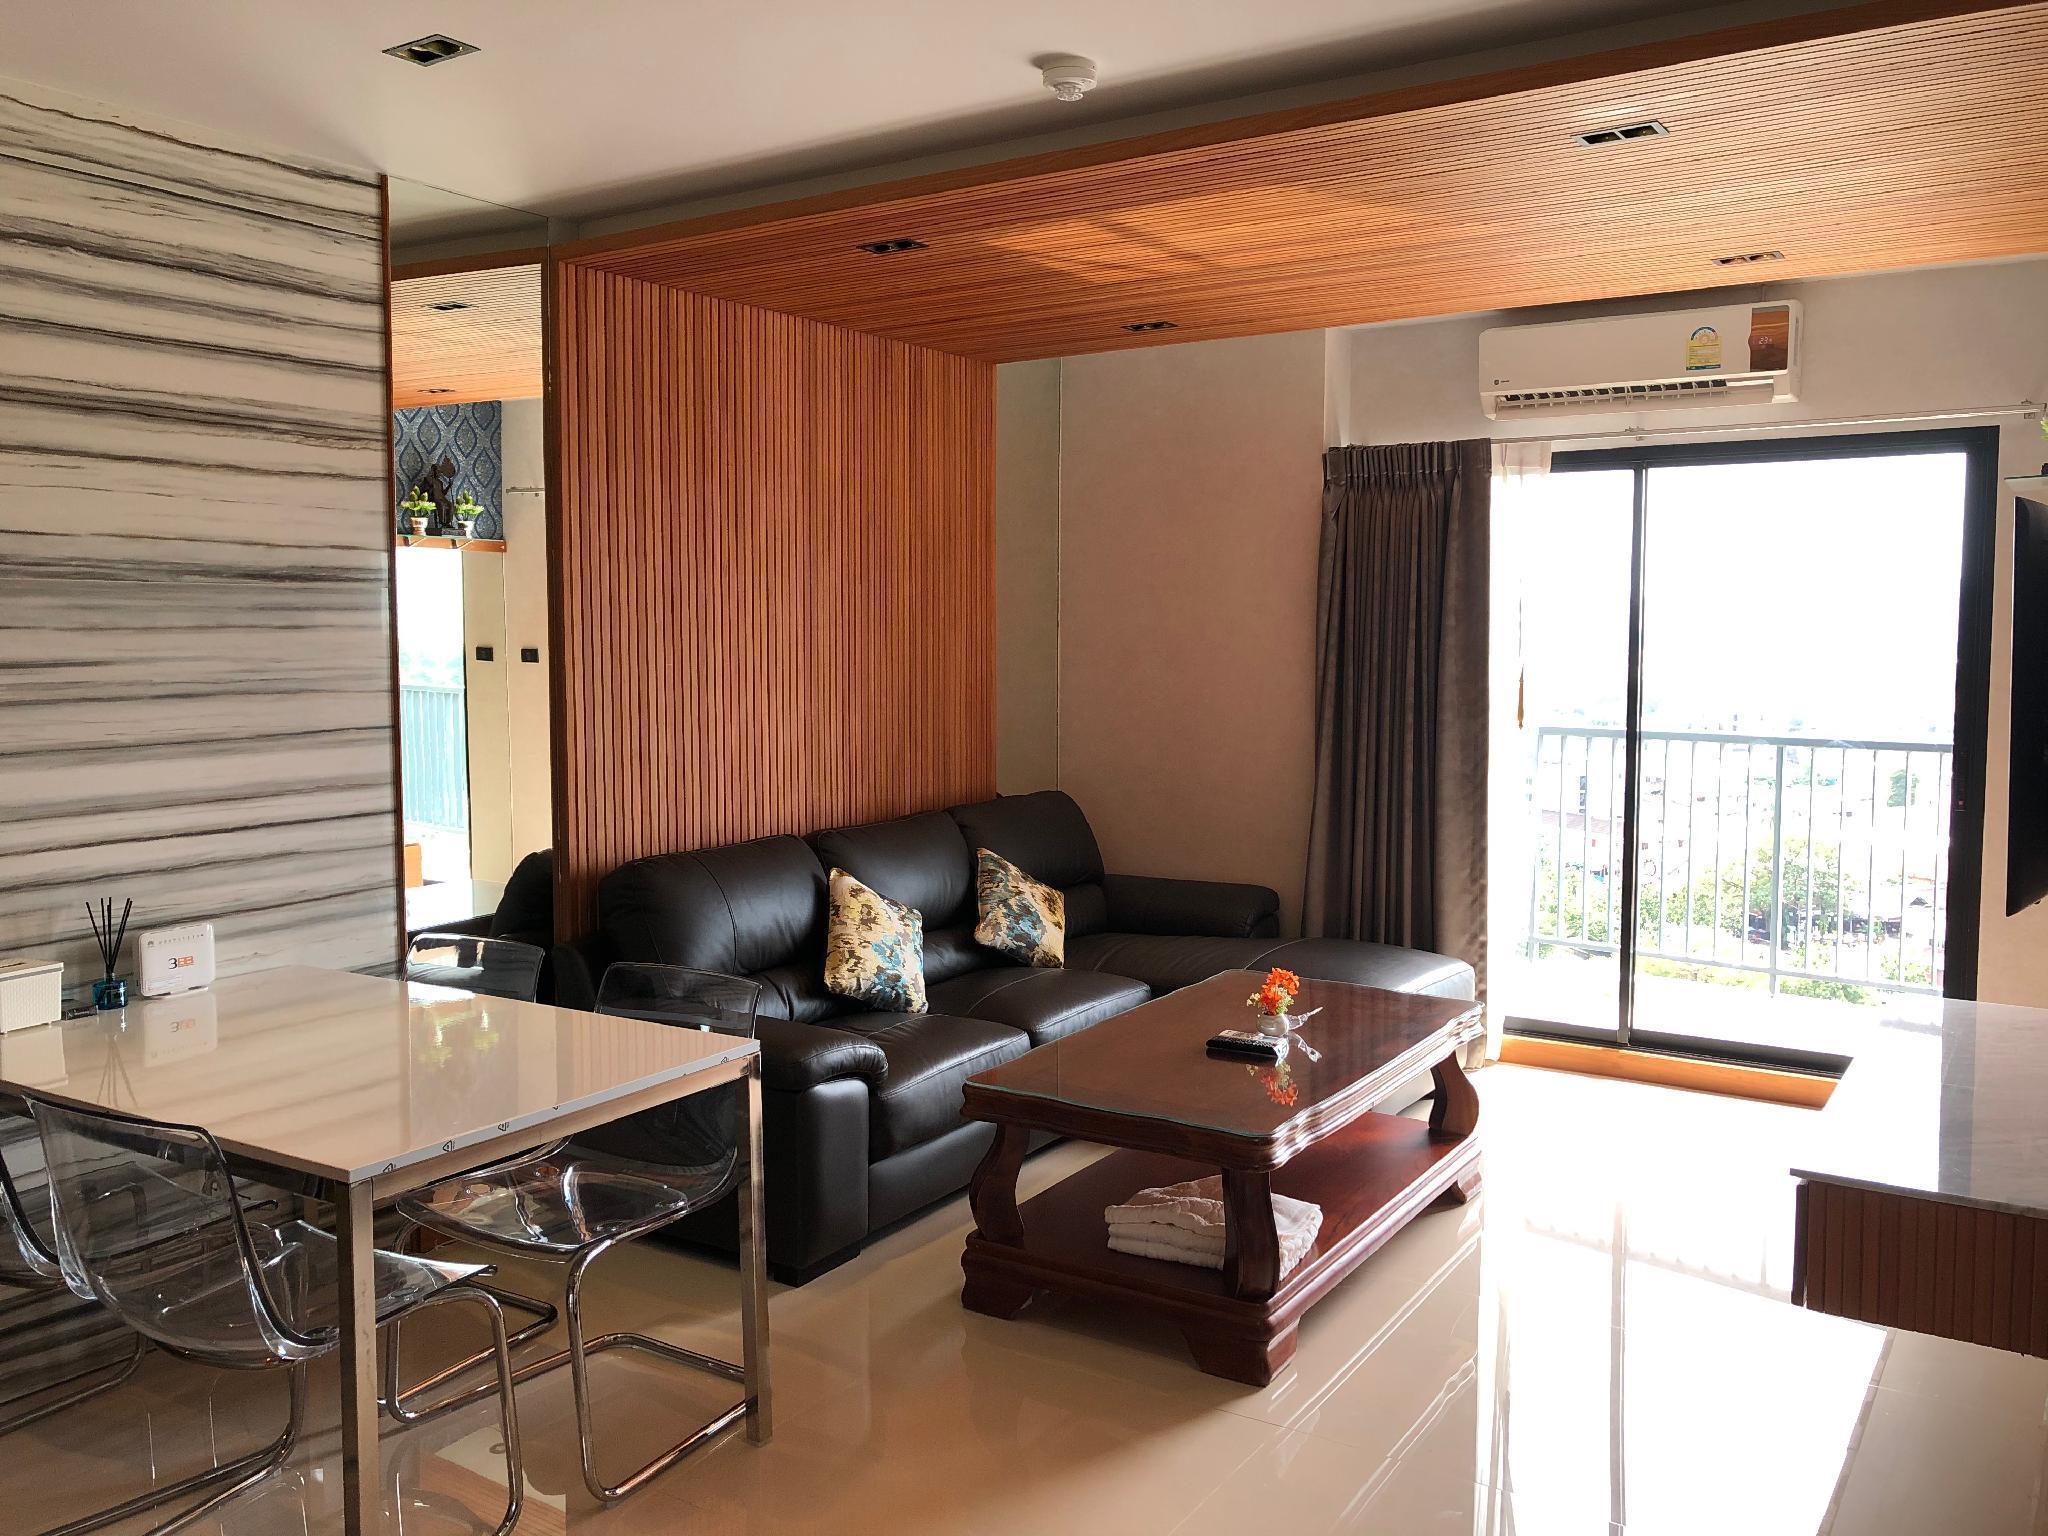 Luxury condominium in Phuket Old Town อพาร์ตเมนต์ 2 ห้องนอน 2 ห้องน้ำส่วนตัว ขนาด 85 ตร.ม. – ตัวเมืองภูเก็ต